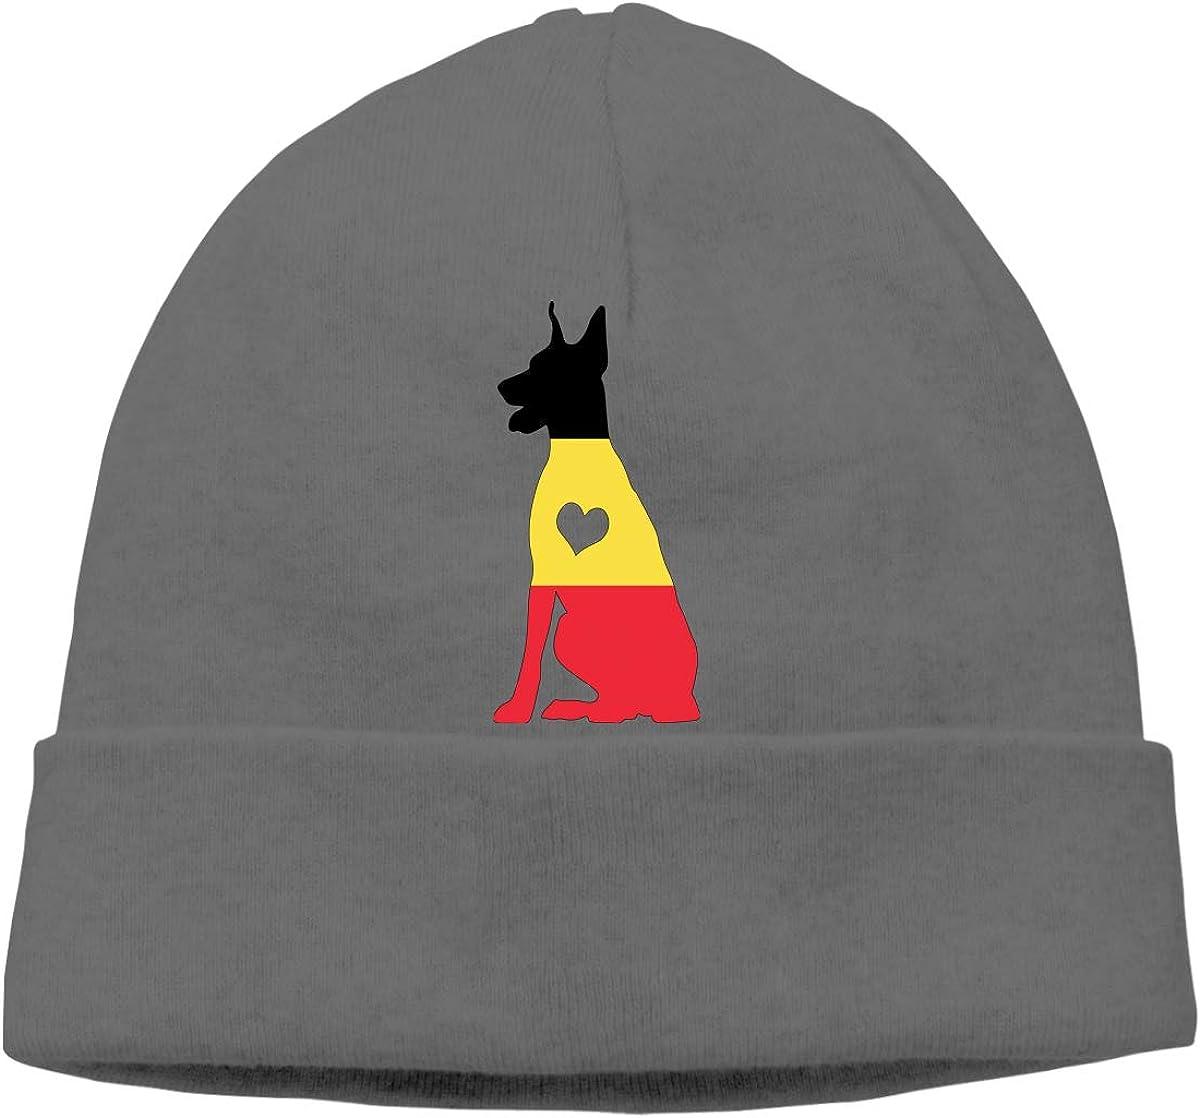 BF5Y3z/&MA Belgium Flag Adore Dobermans Dog Beanie Hat for Men Women,Daily Hedging Cap Ski Cap